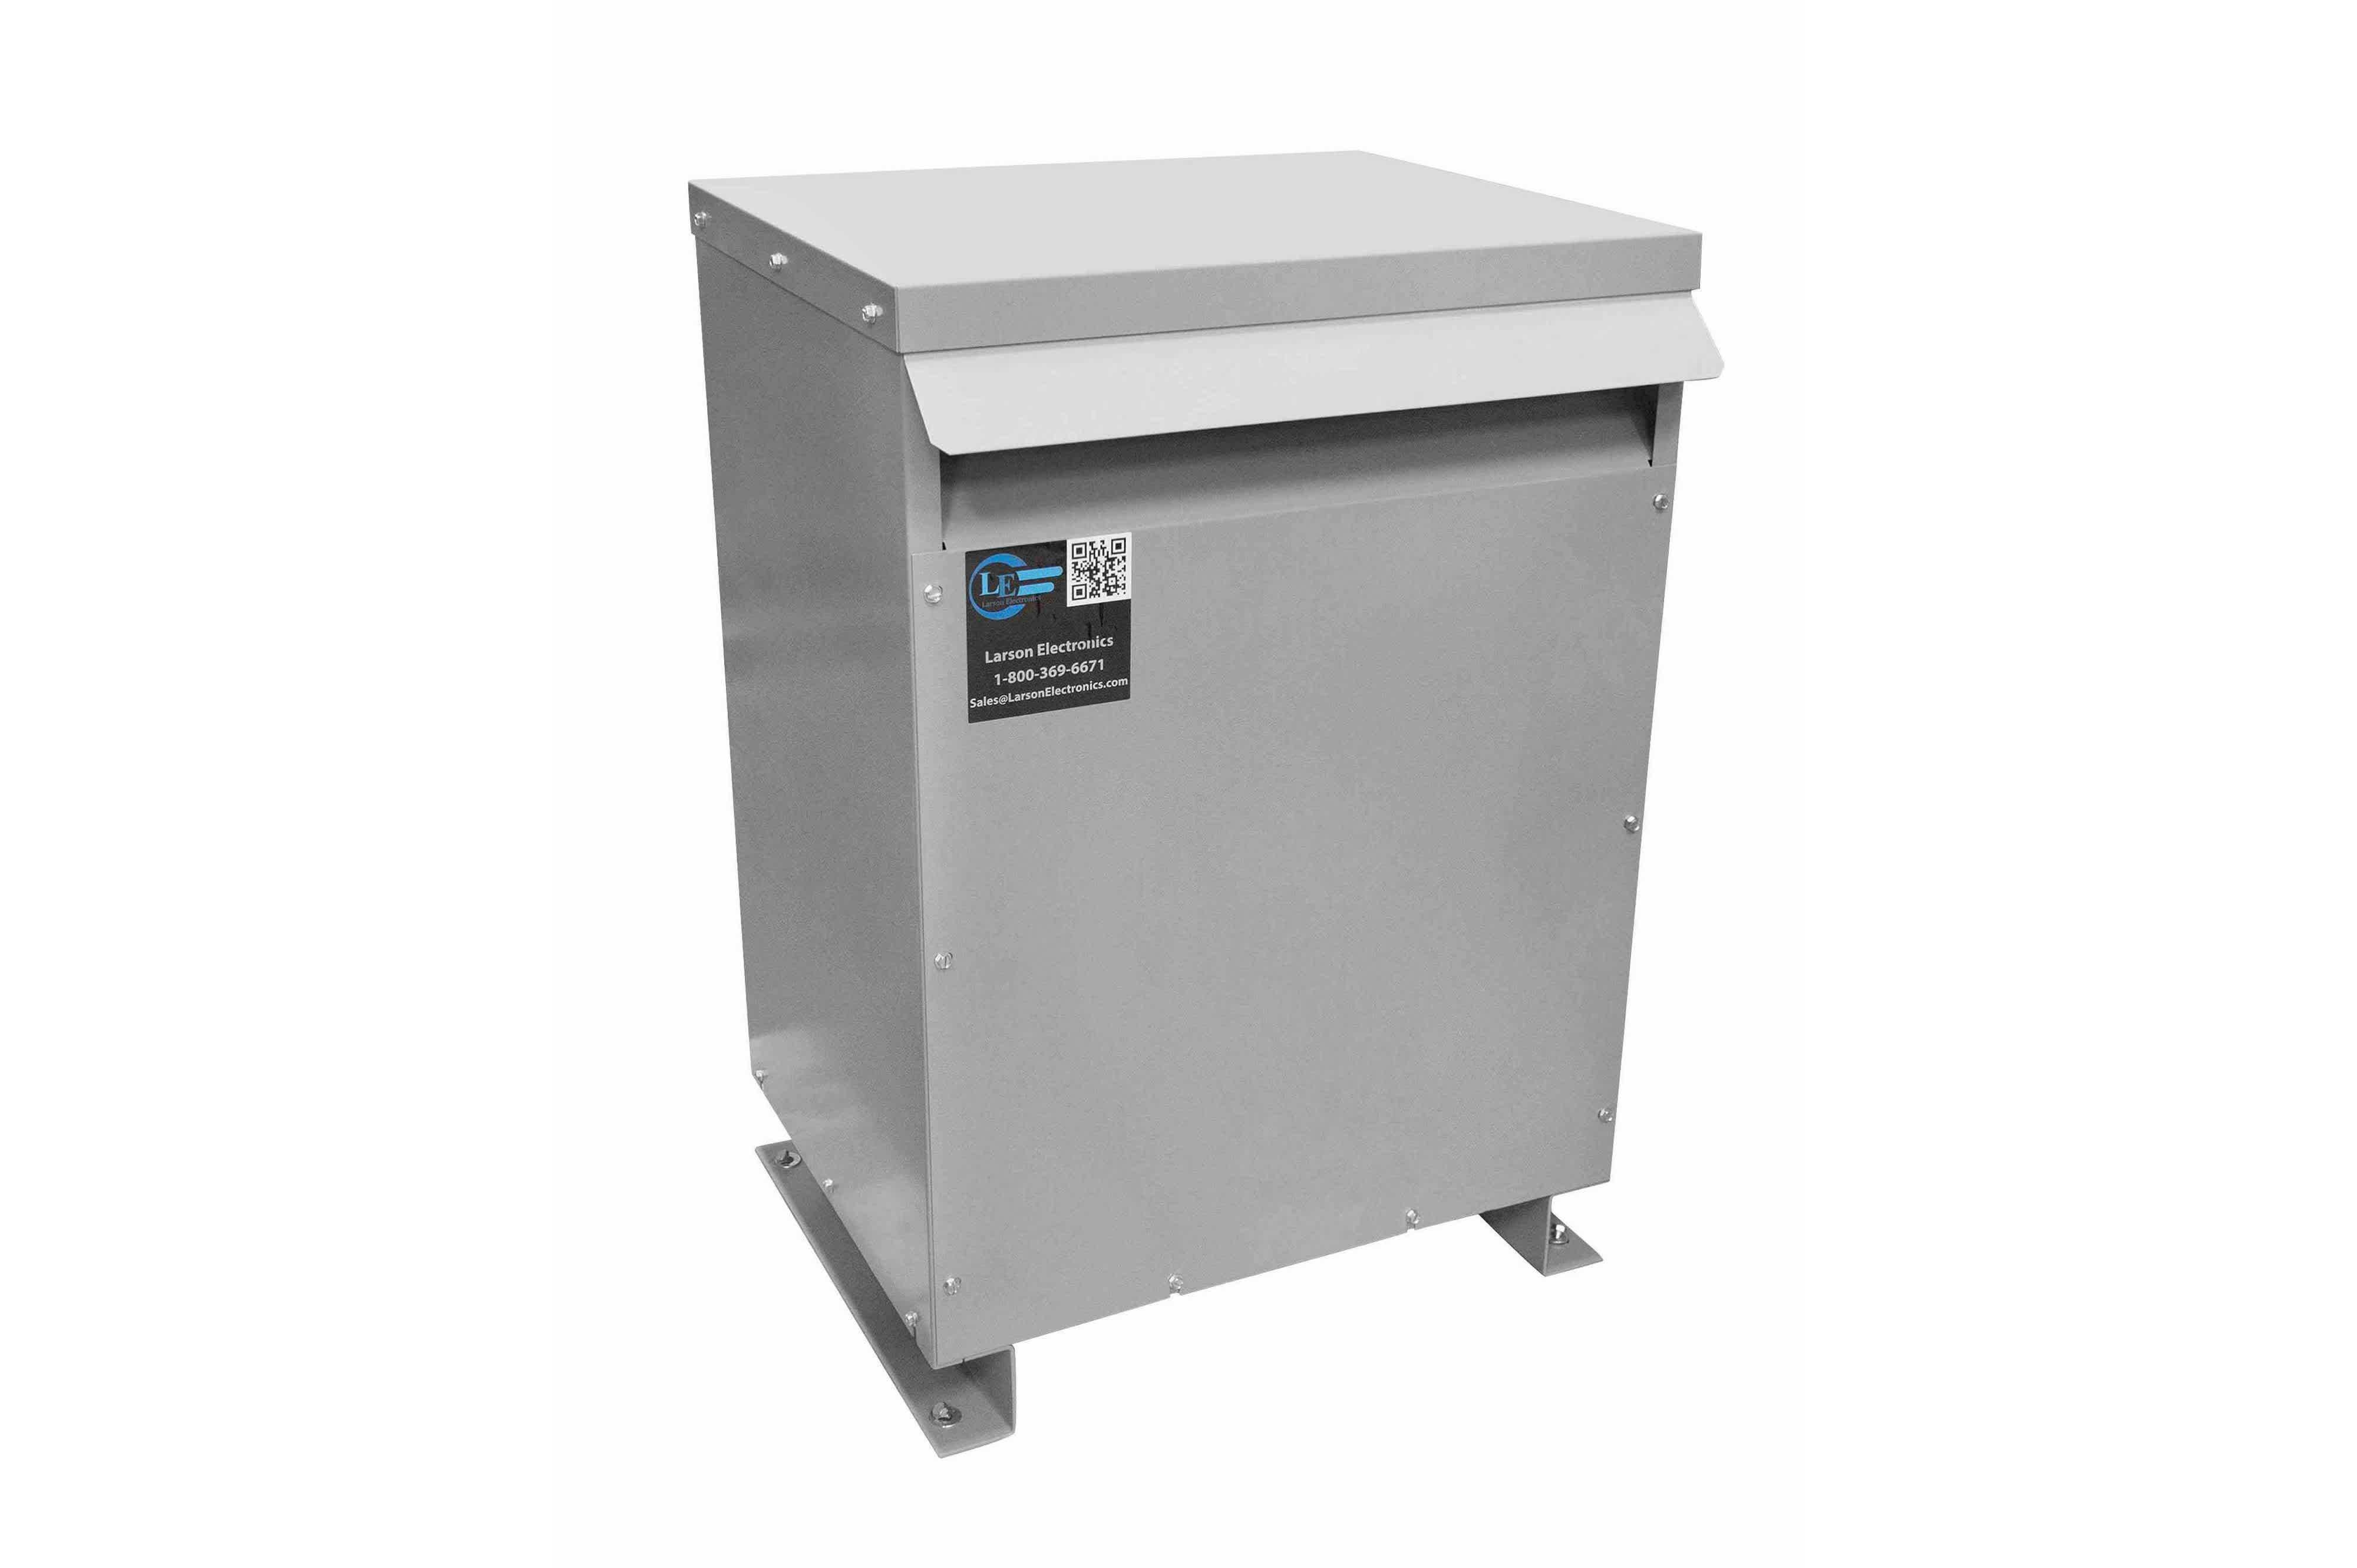 35 kVA 3PH Isolation Transformer, 230V Wye Primary, 480V Delta Secondary, N3R, Ventilated, 60 Hz